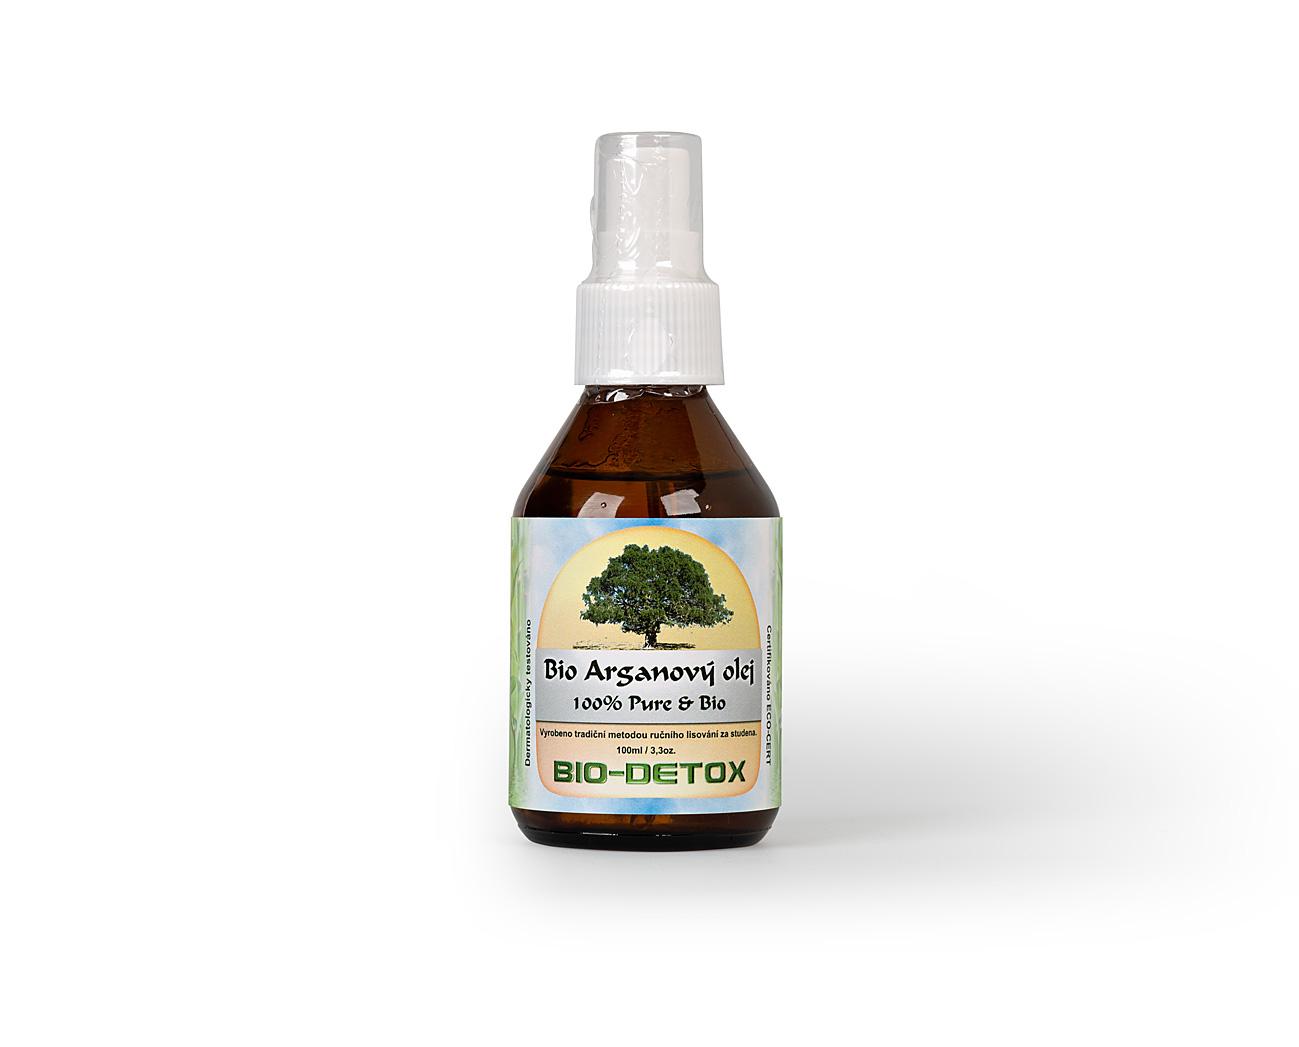 Bio-Detox BIO Arganový olej 100ml